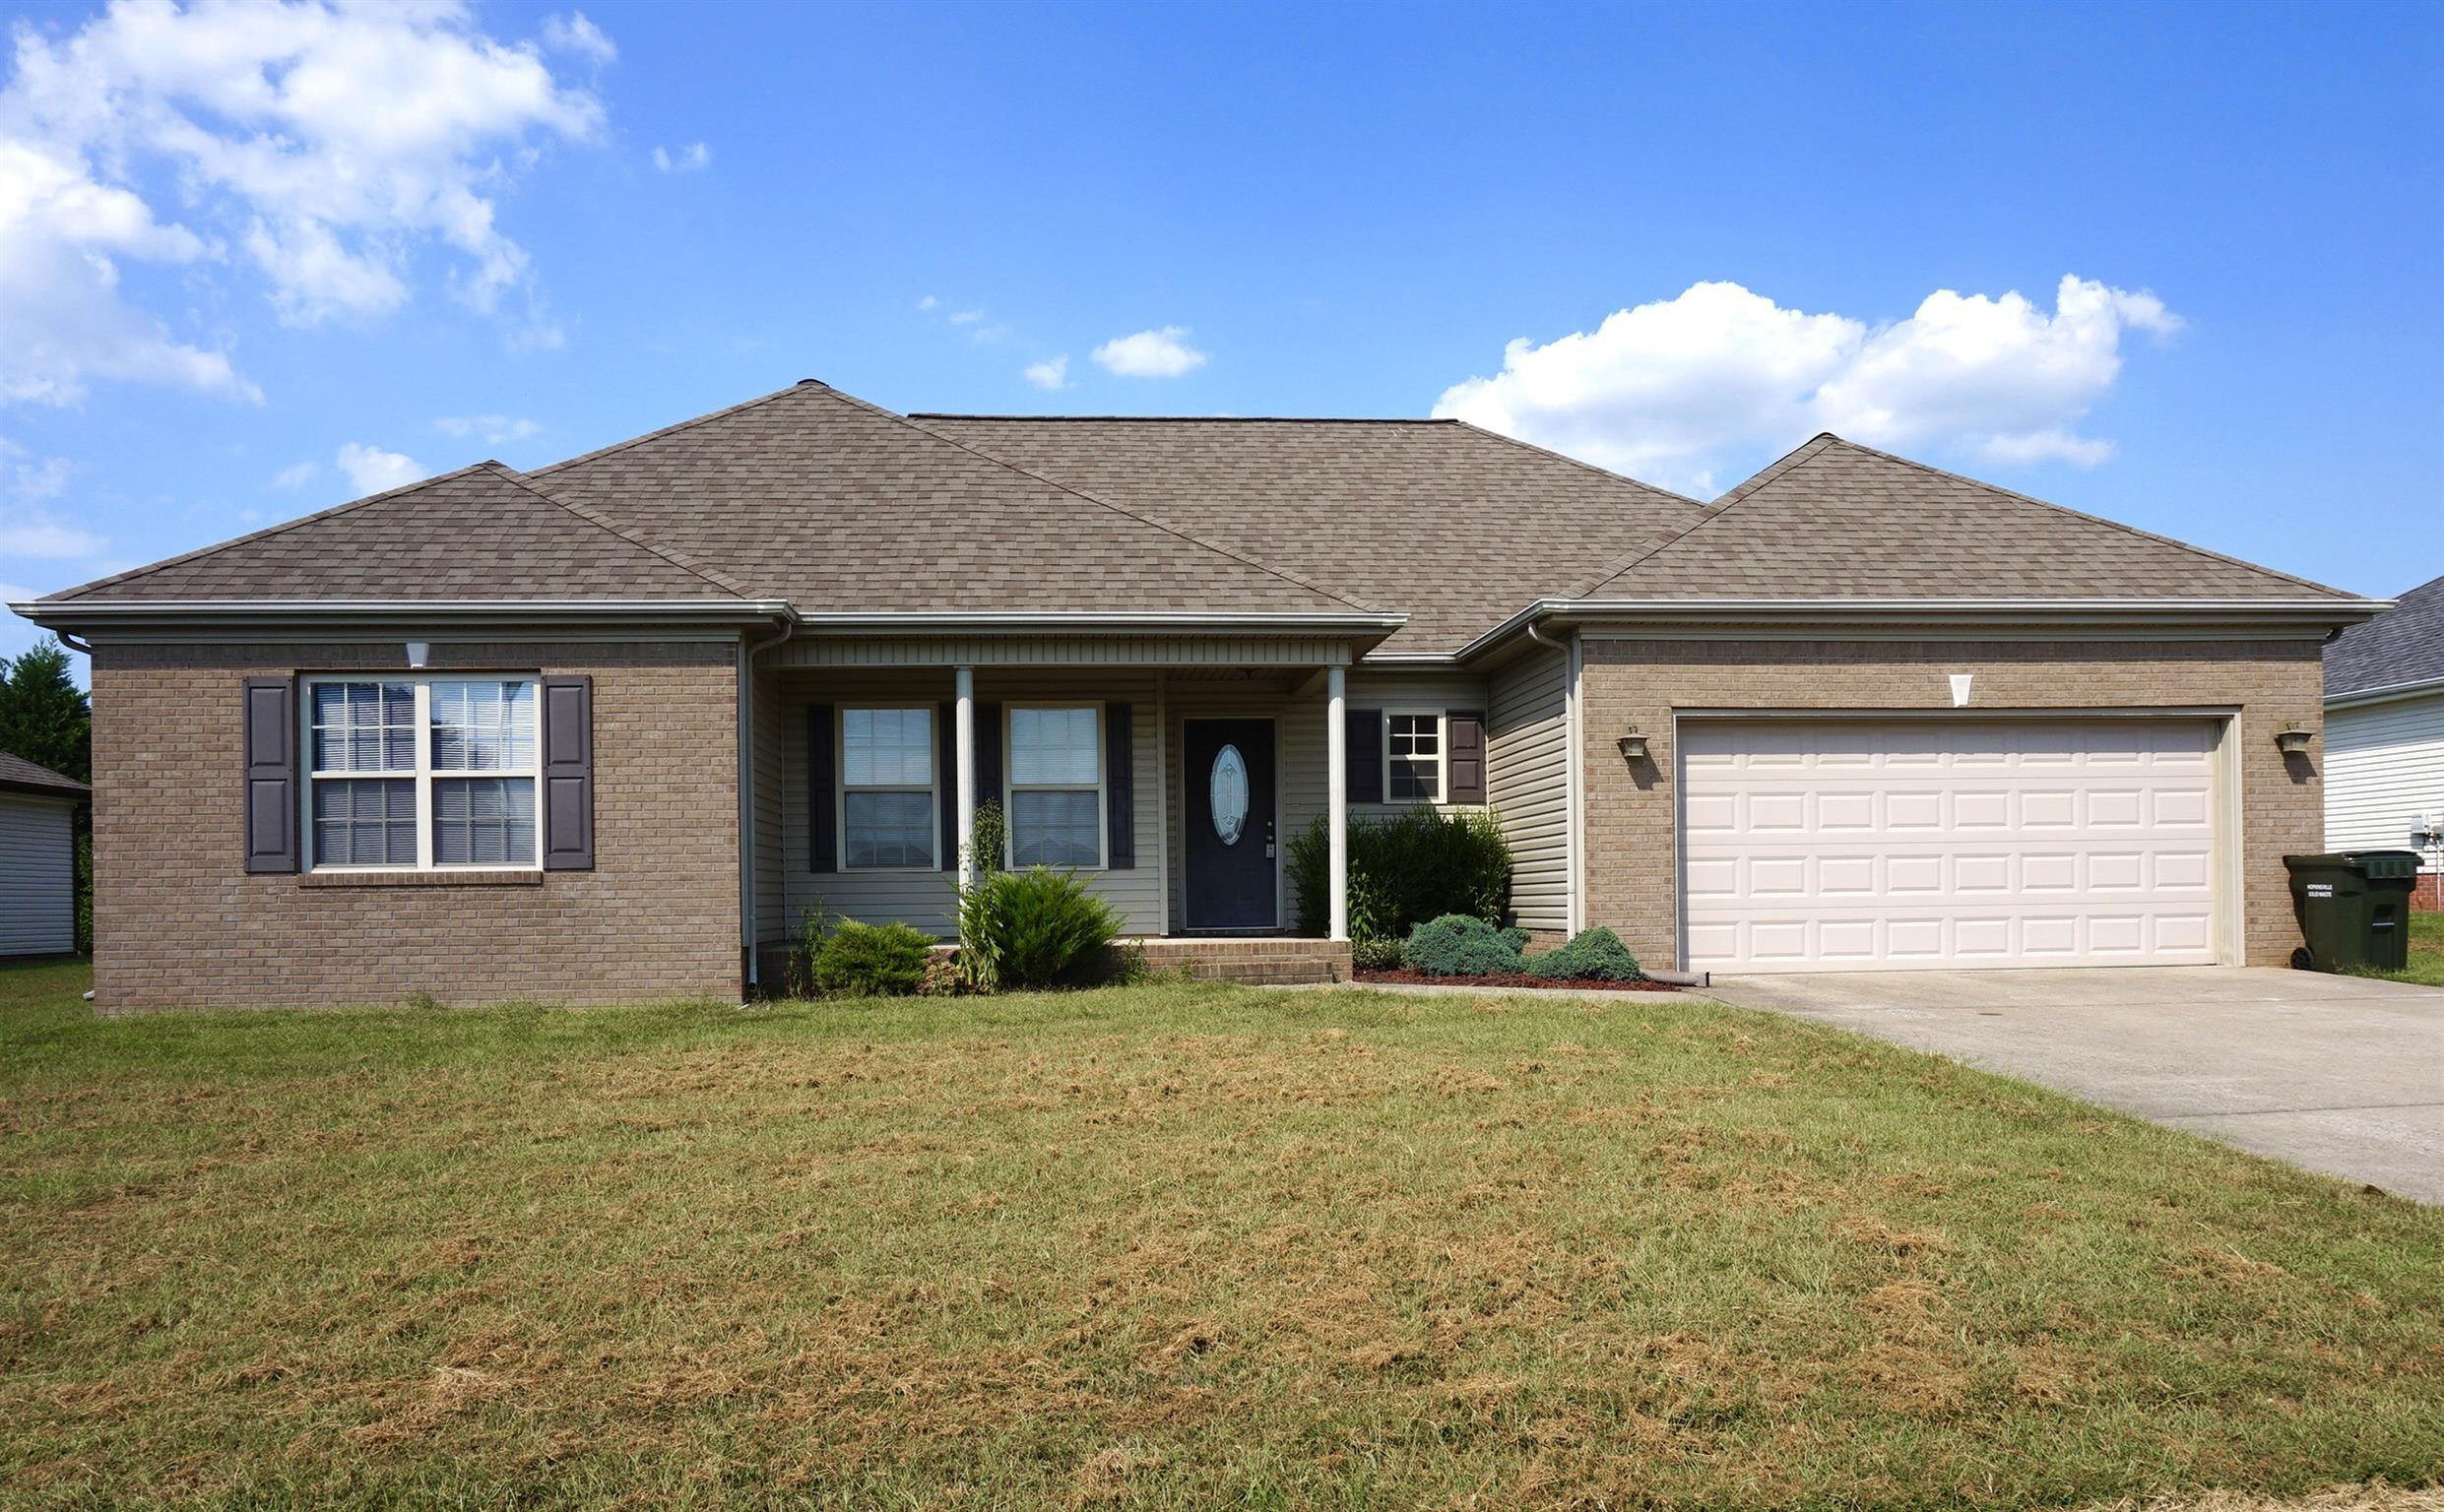 208 Westminster Place, Hopkinsville, KY 42240 - Hopkinsville, KY real estate listing